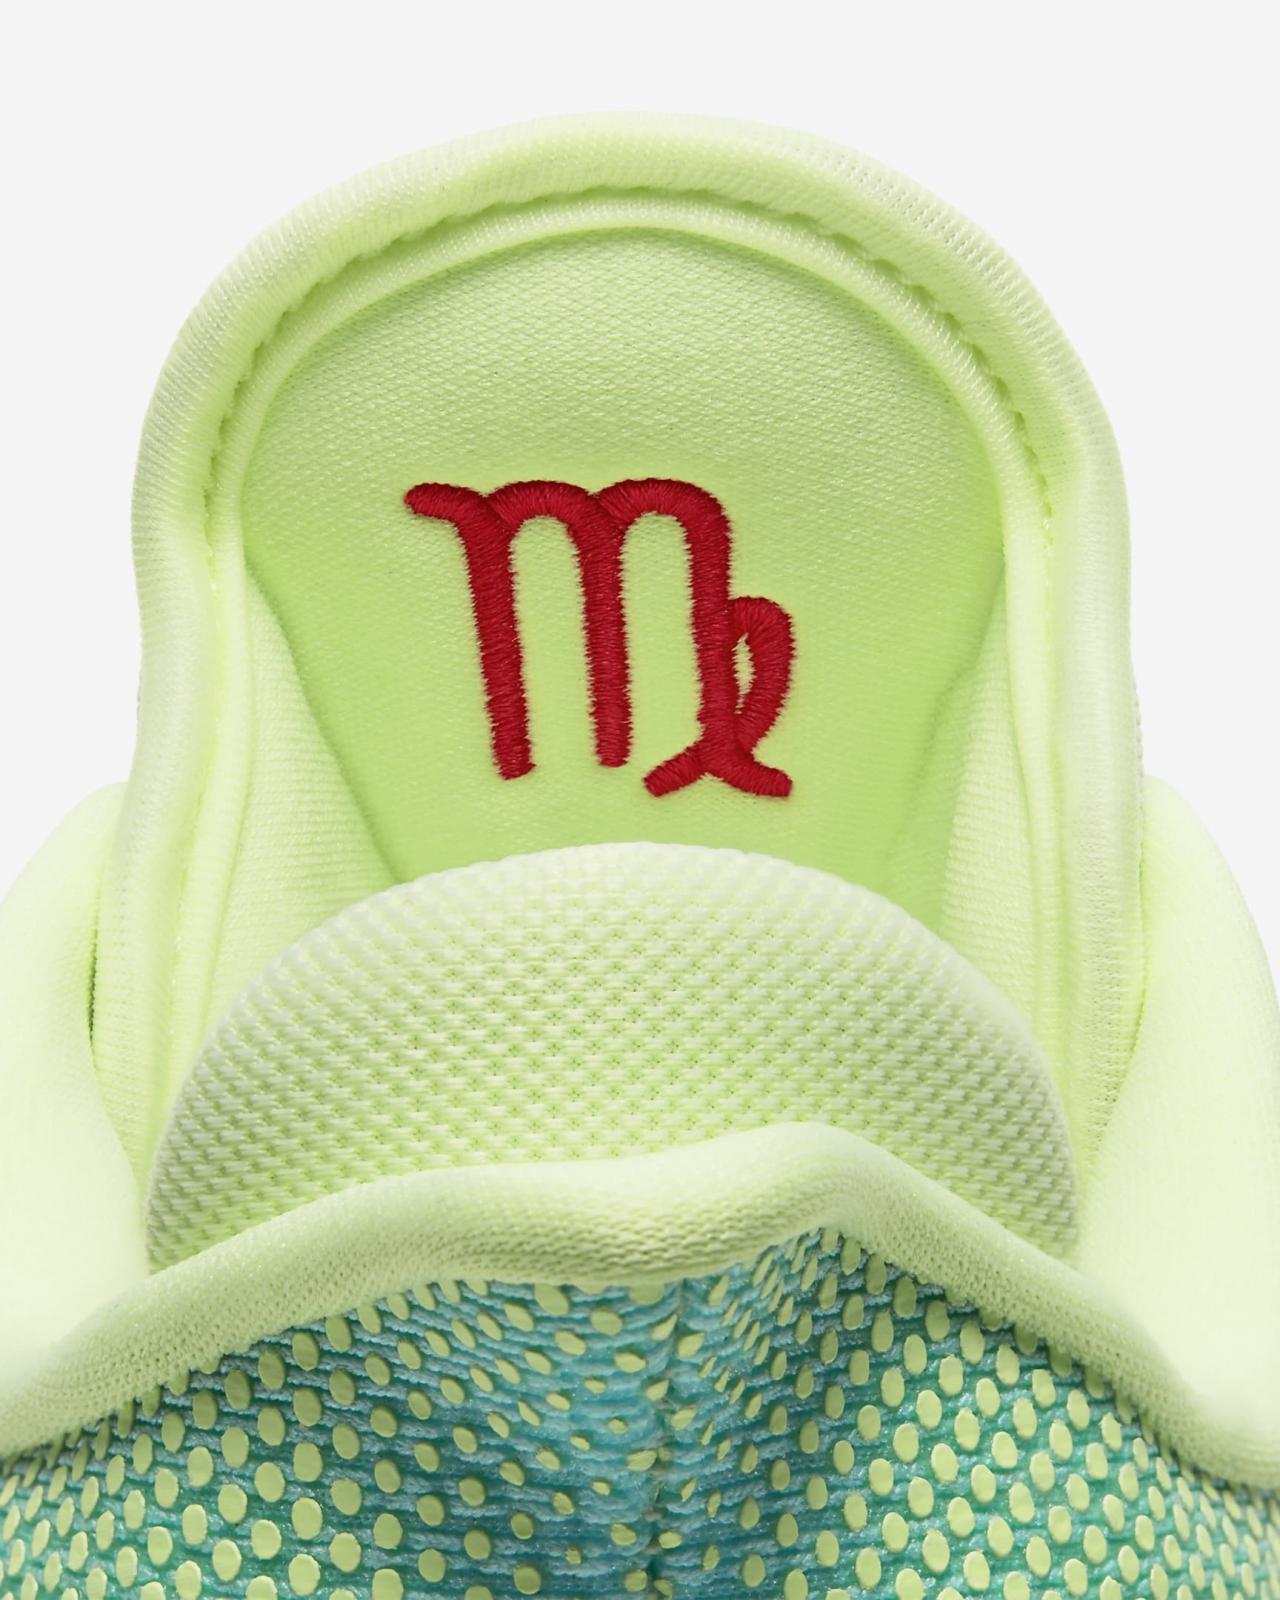 Nike Basketball发布全新微黄绿/粉蓝/亮深红/黑色Air Zoom BB NXT